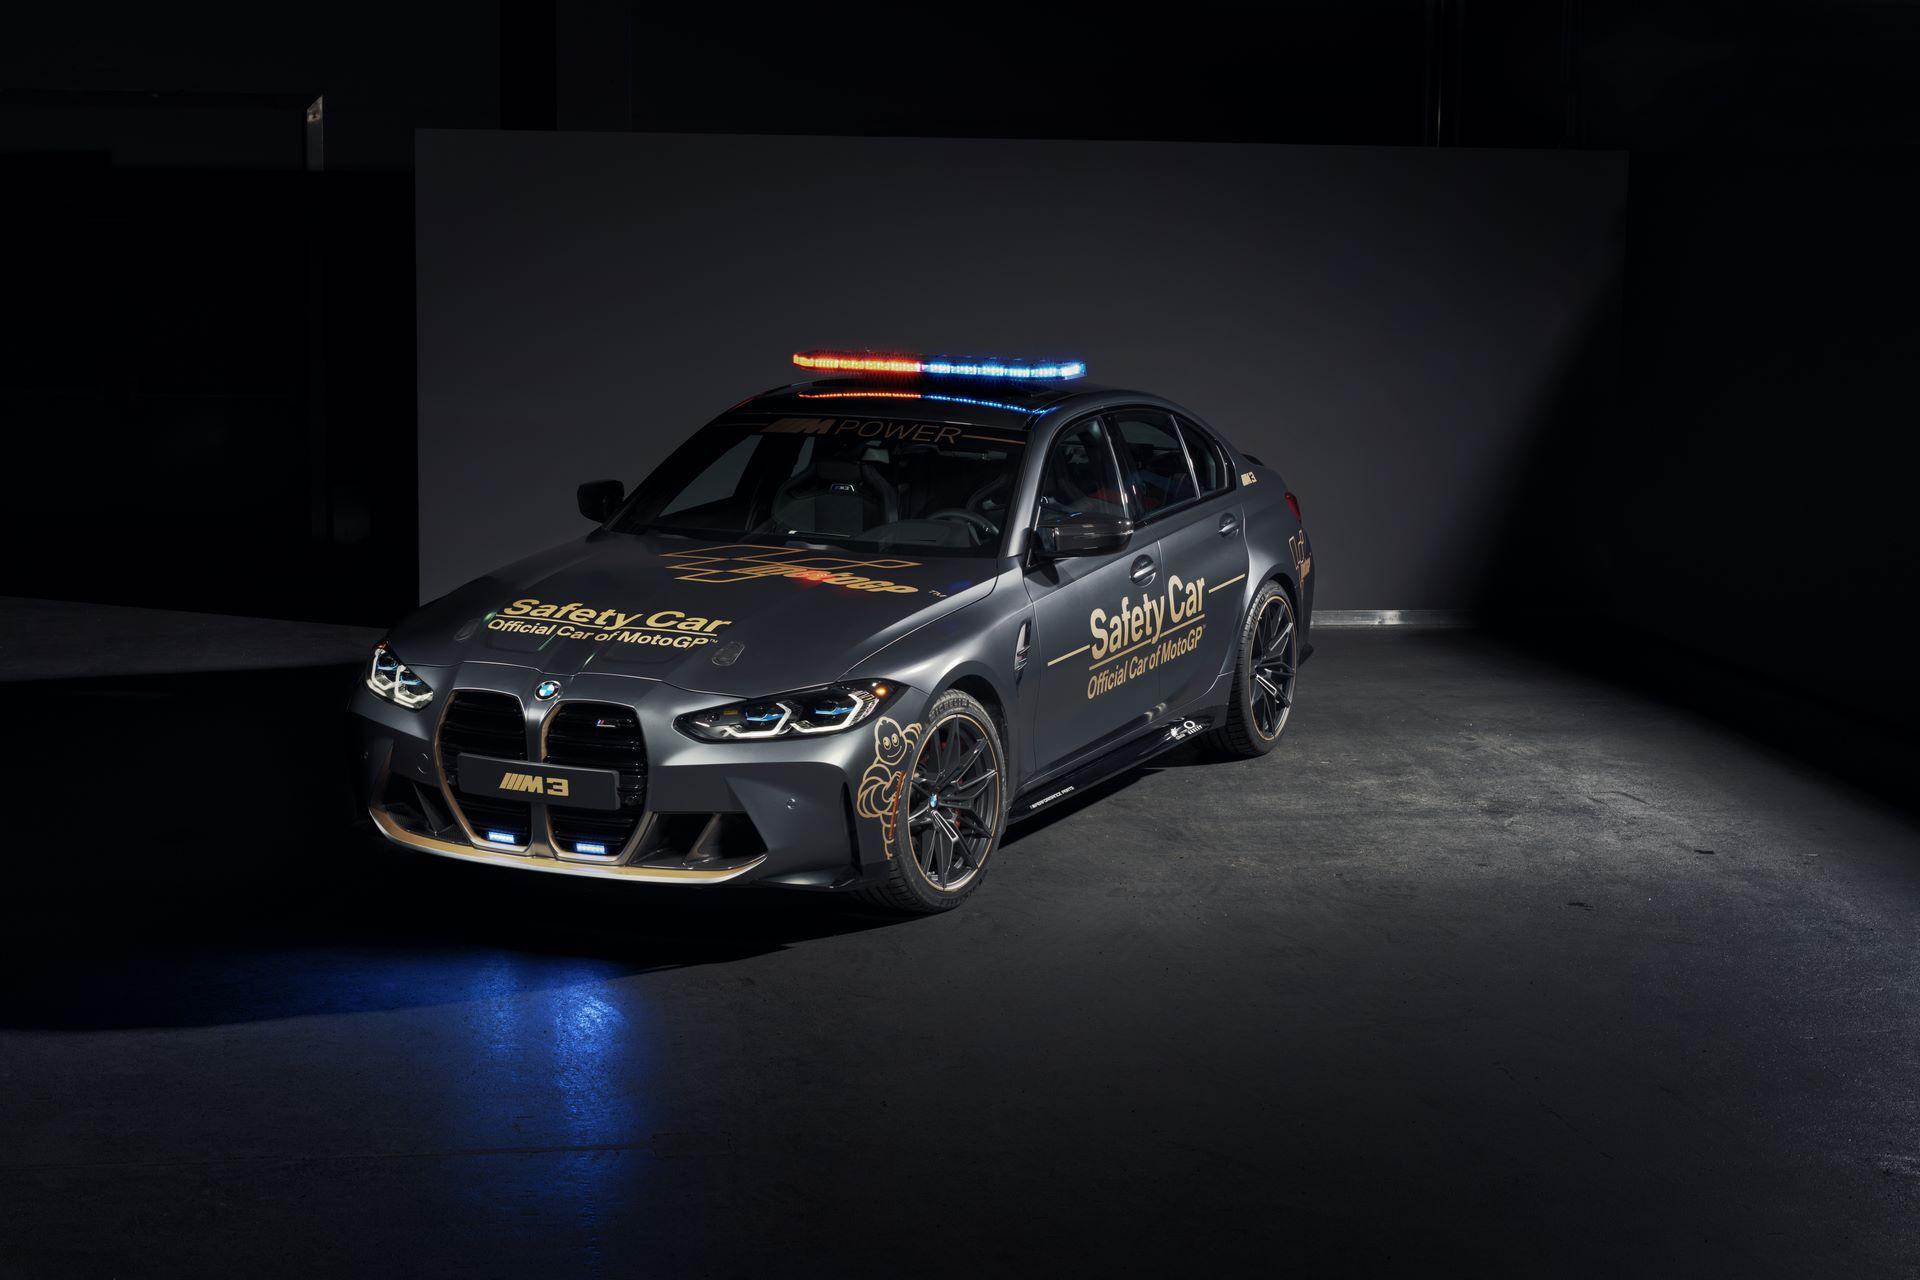 BMW-M3-M4-M5-CS-Safety-Cars-moto-gp-motogp-3